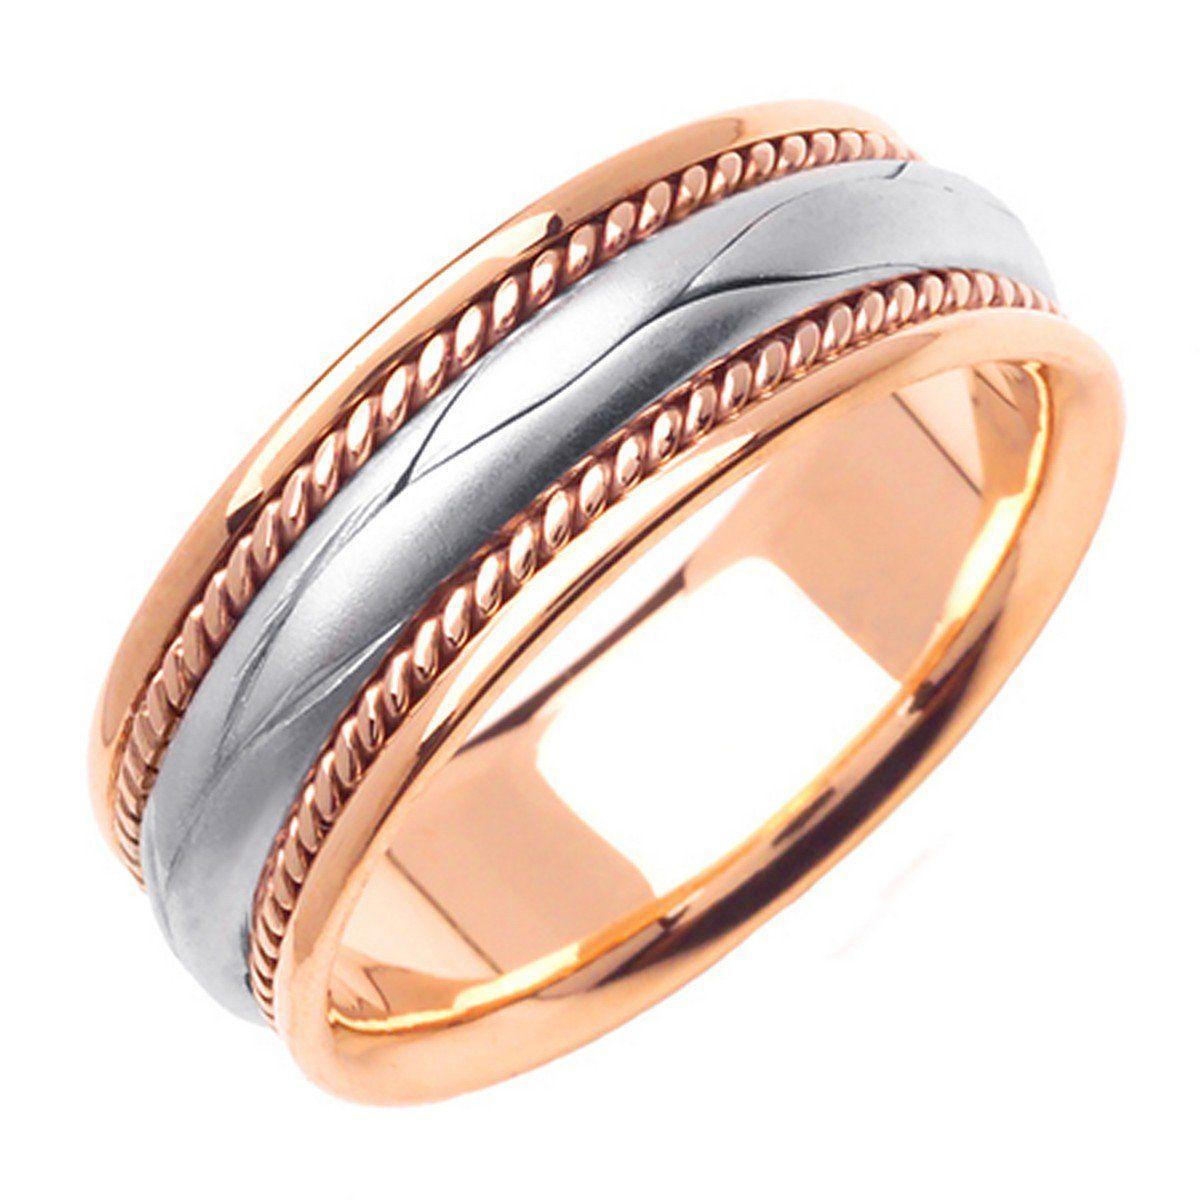 14K Rose Gold Braided Rope Edge Men's Wedding Band (8mm